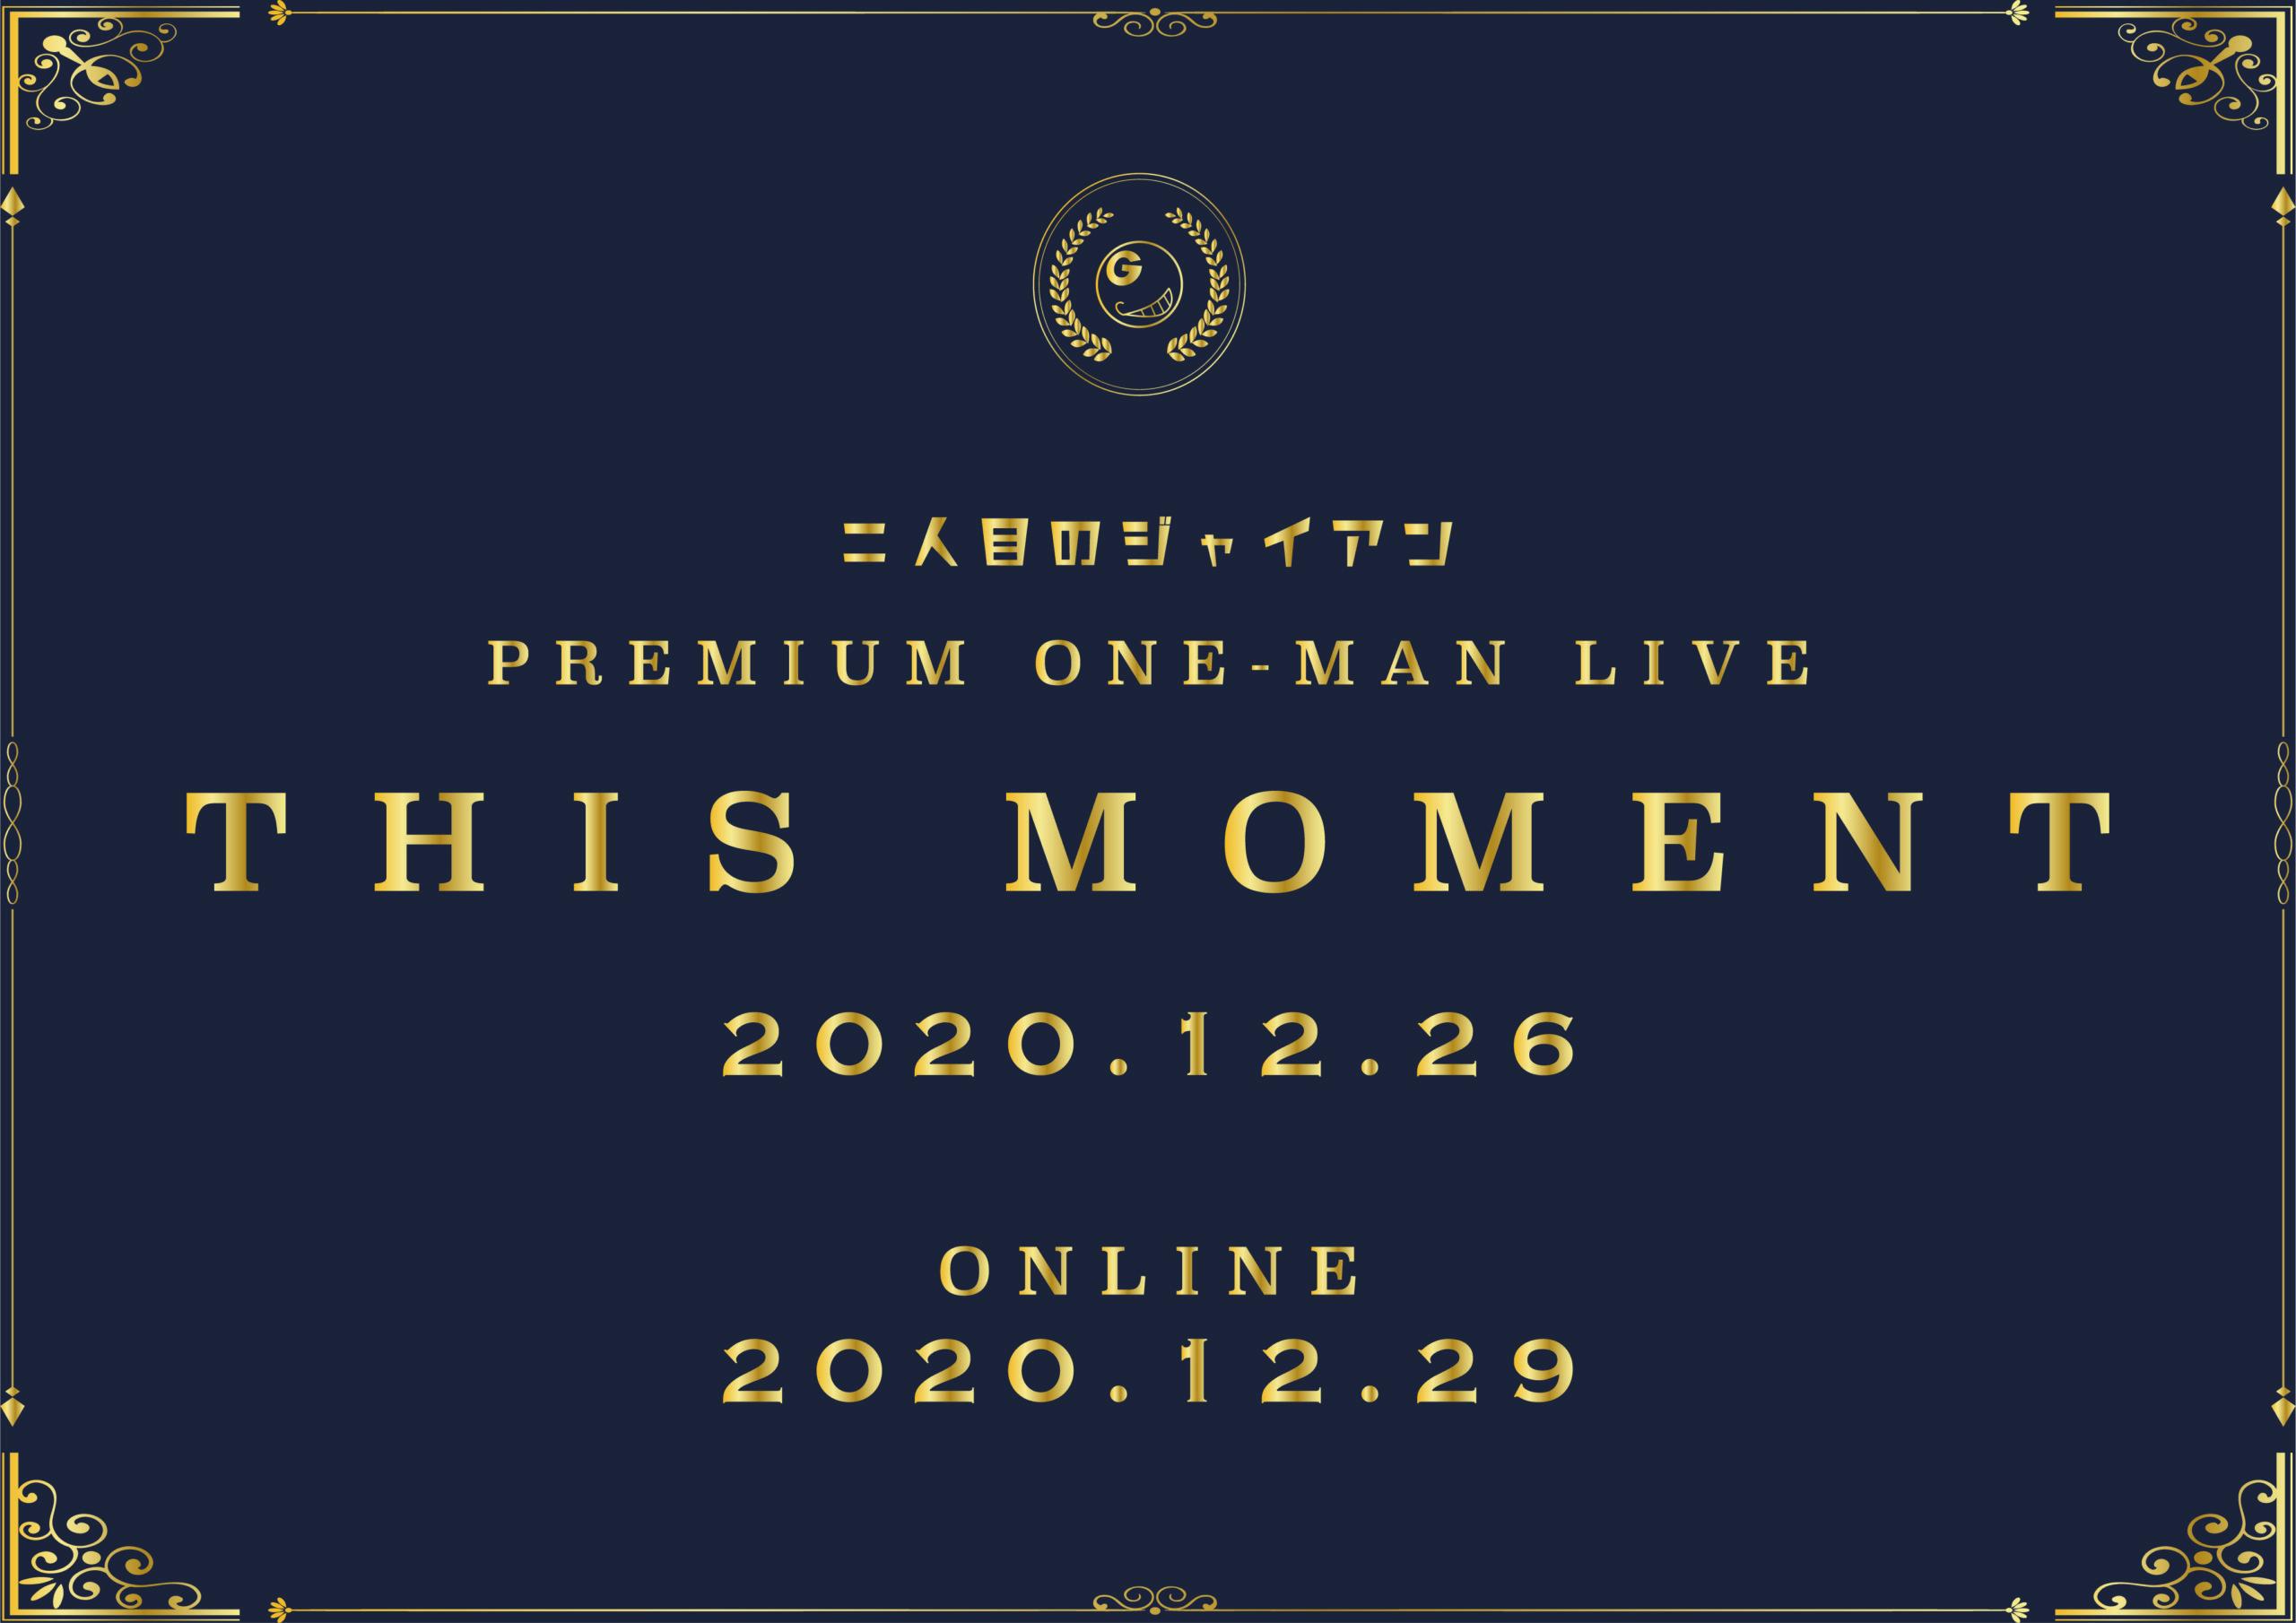 PREMIUM ONE-MAN LIVE 『THIS MOMENT』